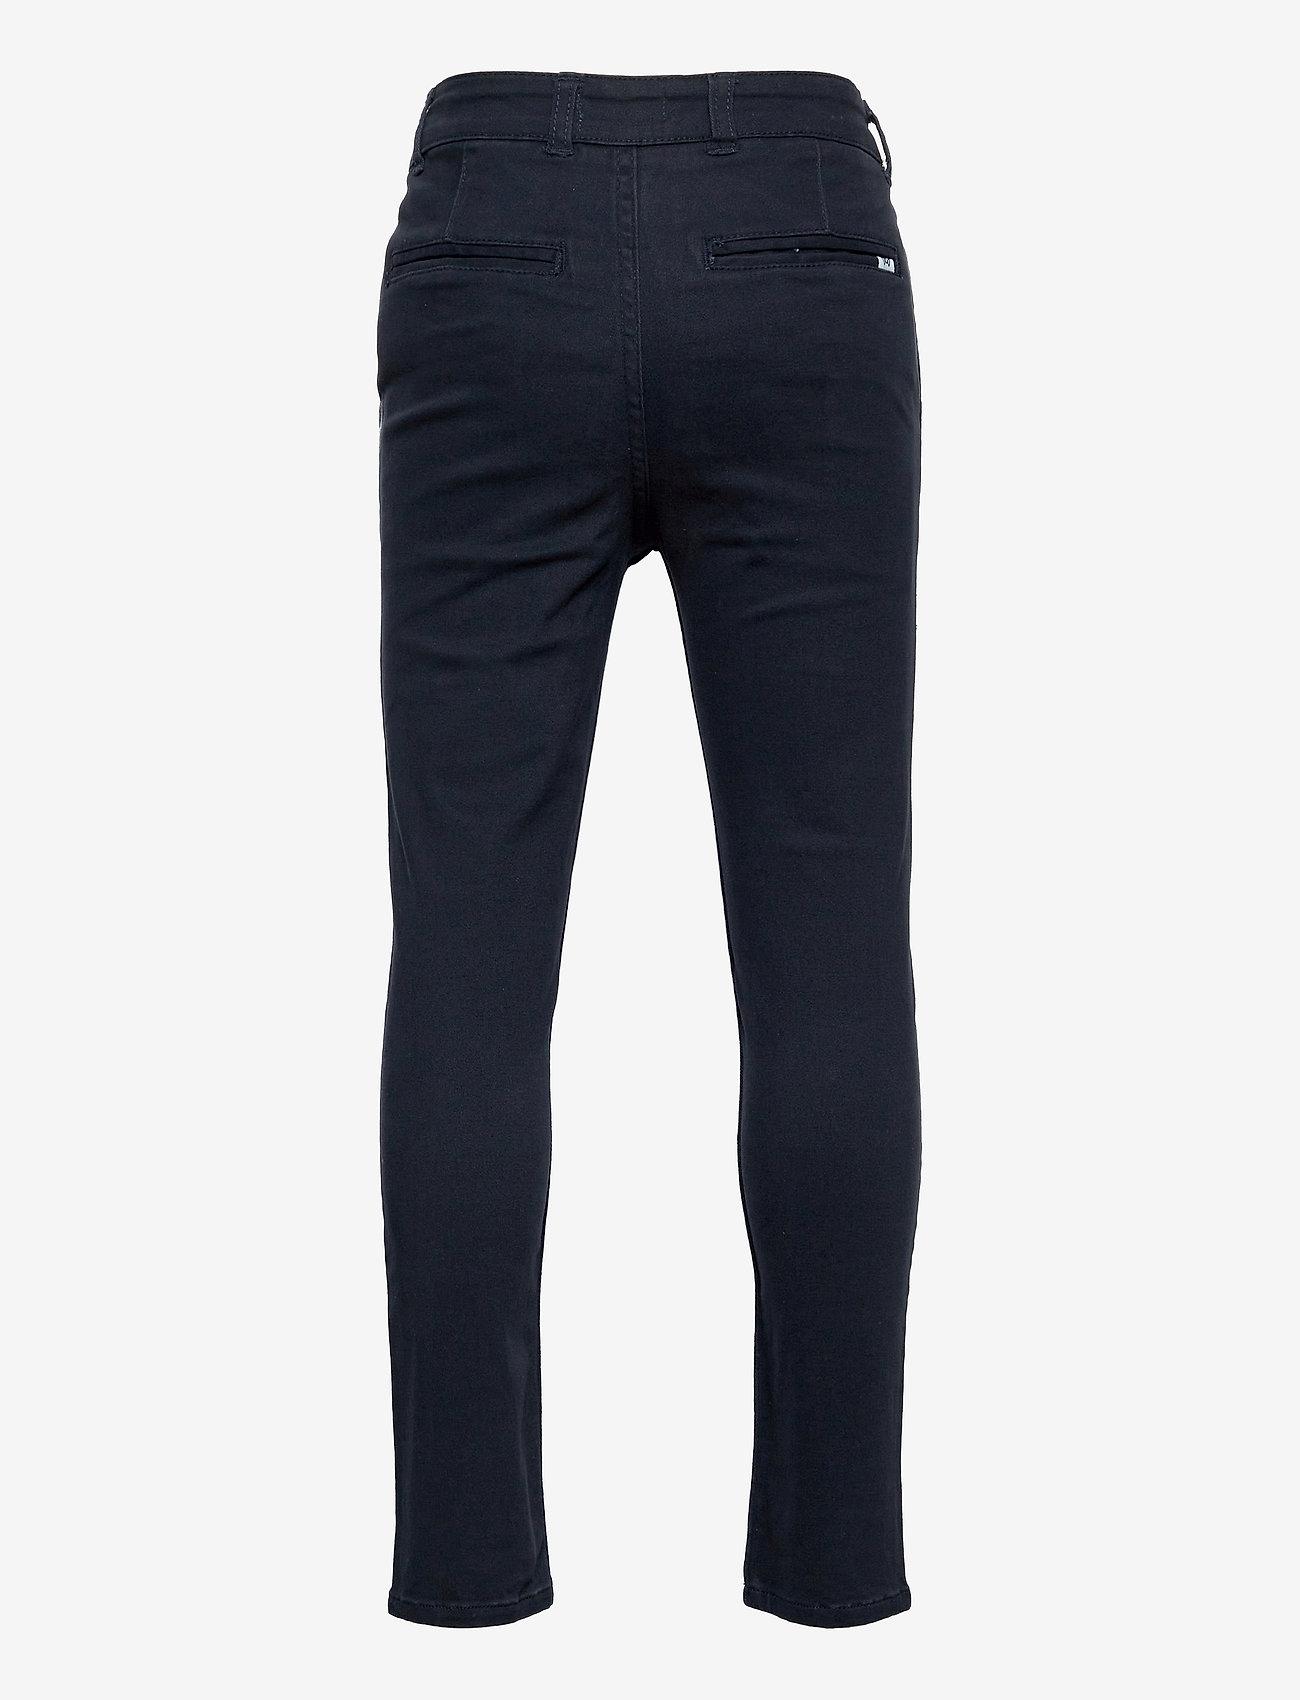 Kronstadt - Daniel Chino - trousers - navy - 1